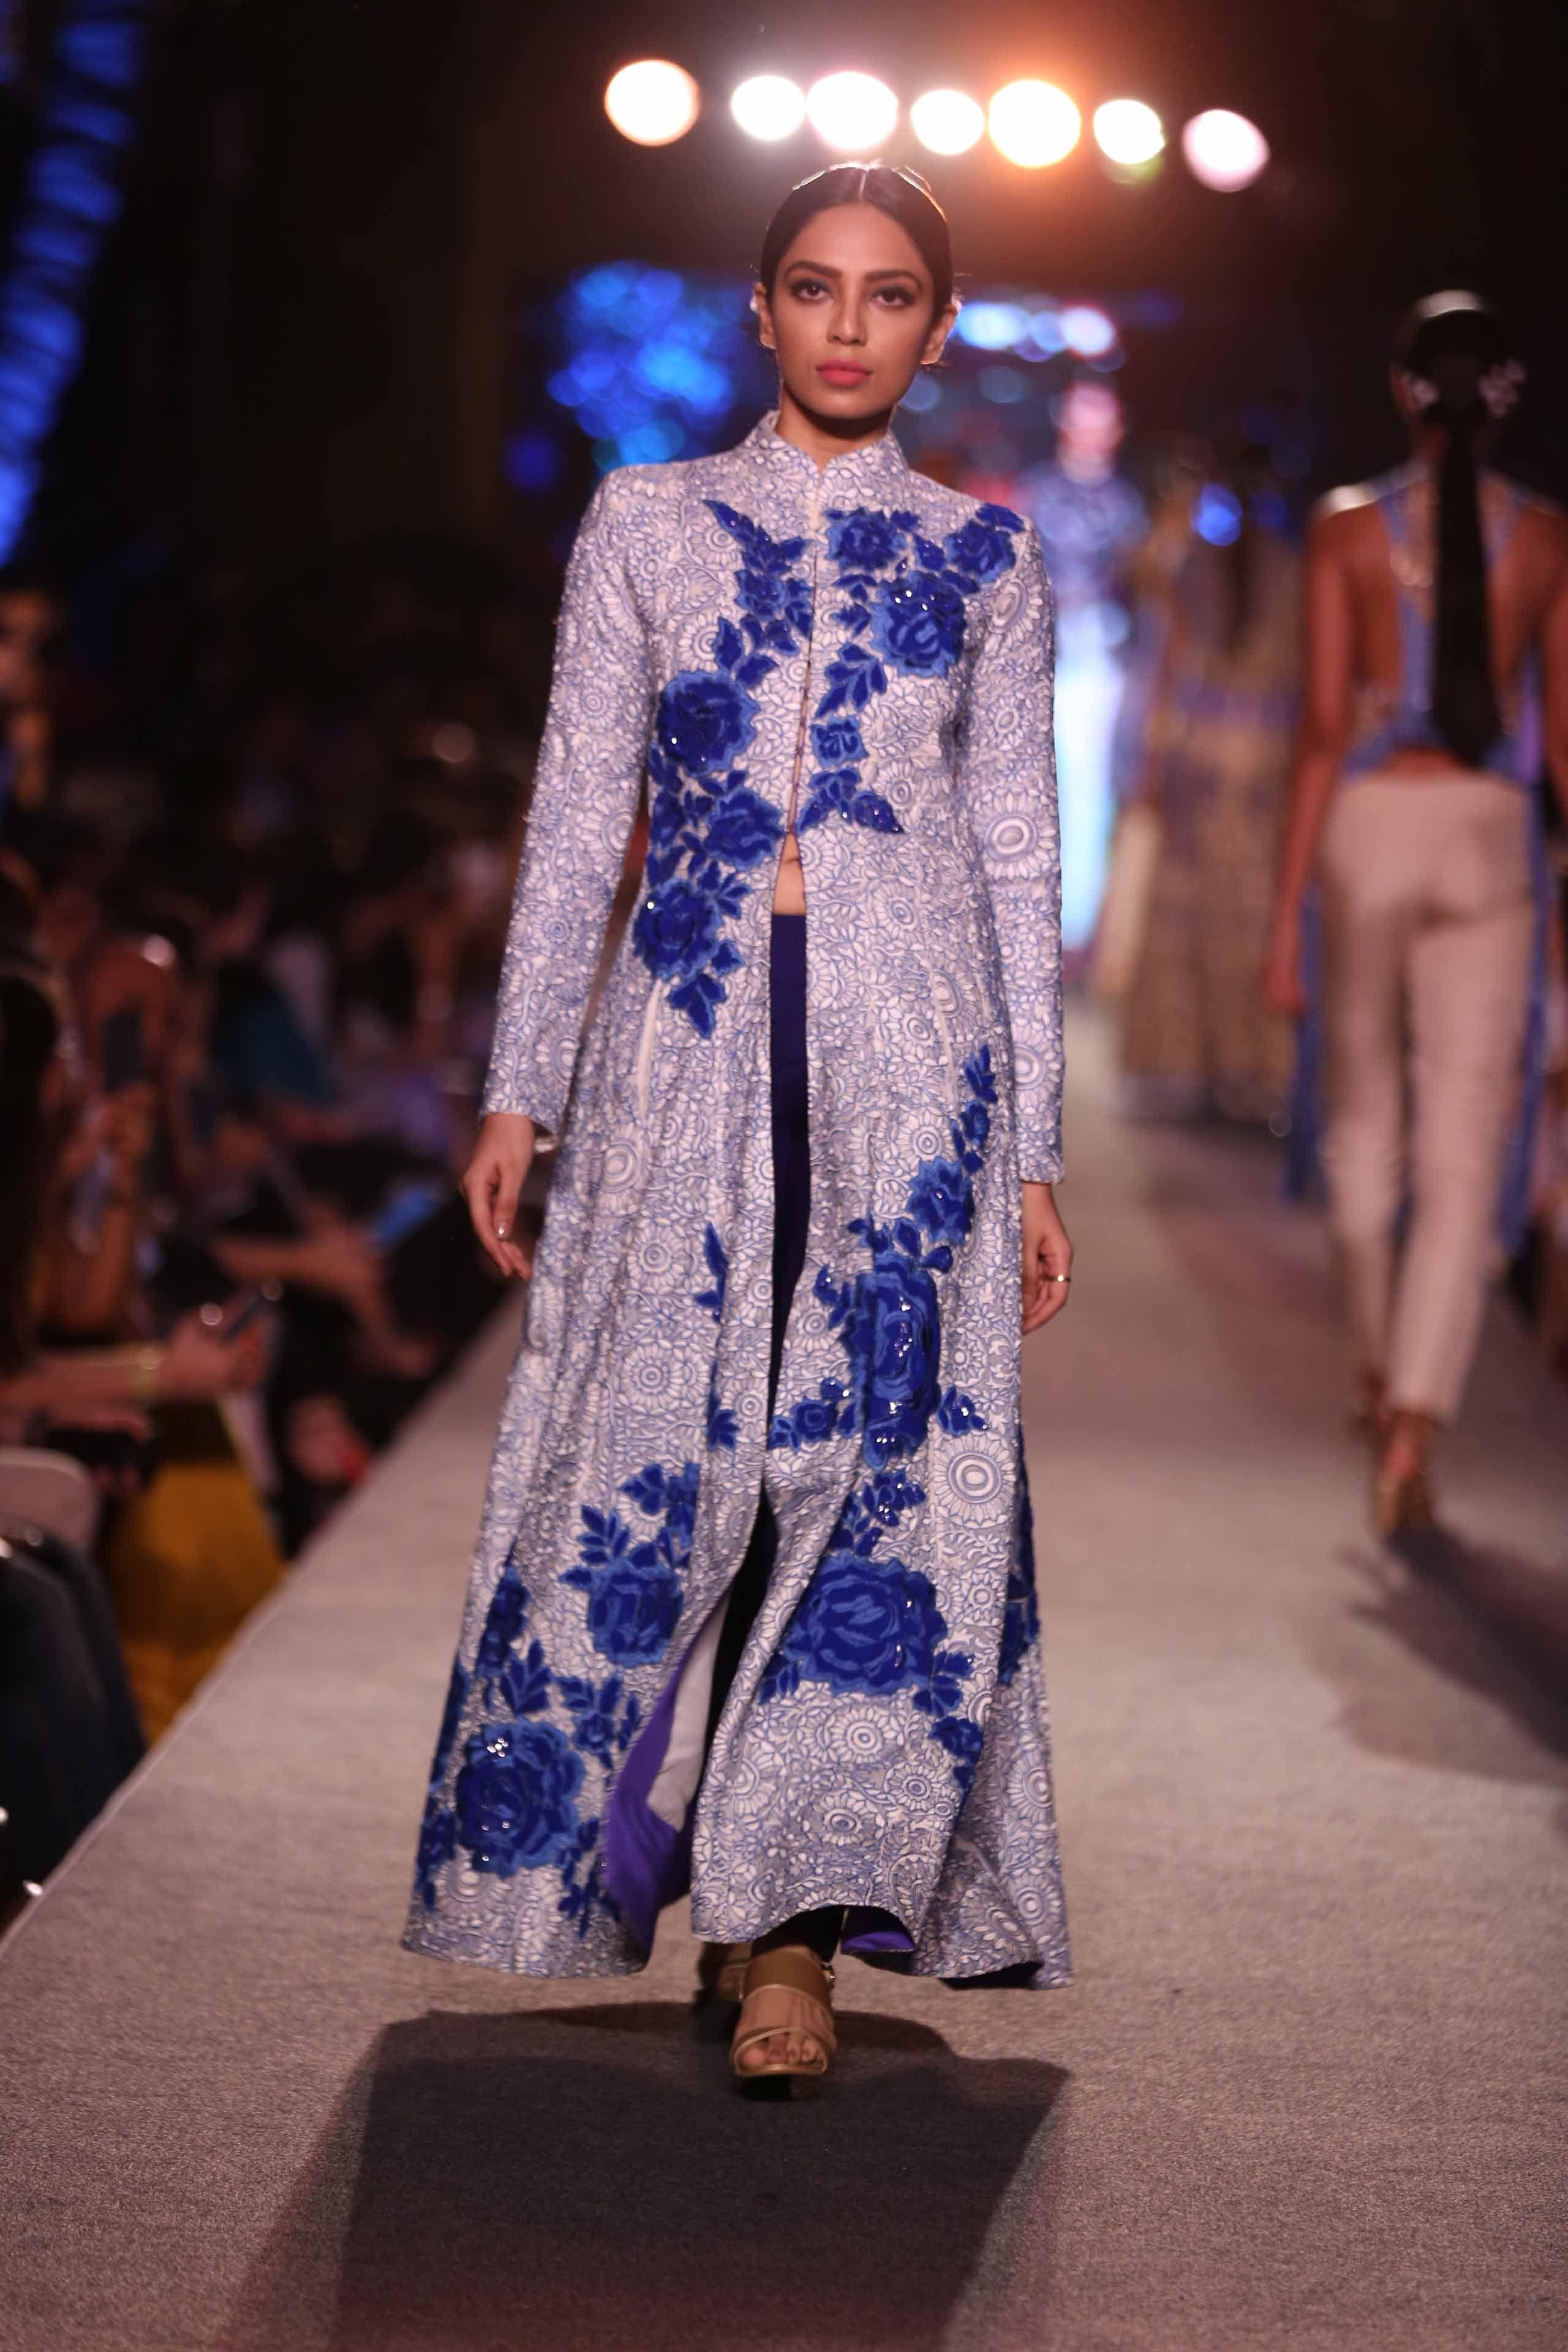 d43813c94bcd The Blue Fashion Runway Collection by Manish Malhotra at Lakme Fashion Week  Summer Resort 2015.  JabongLFW